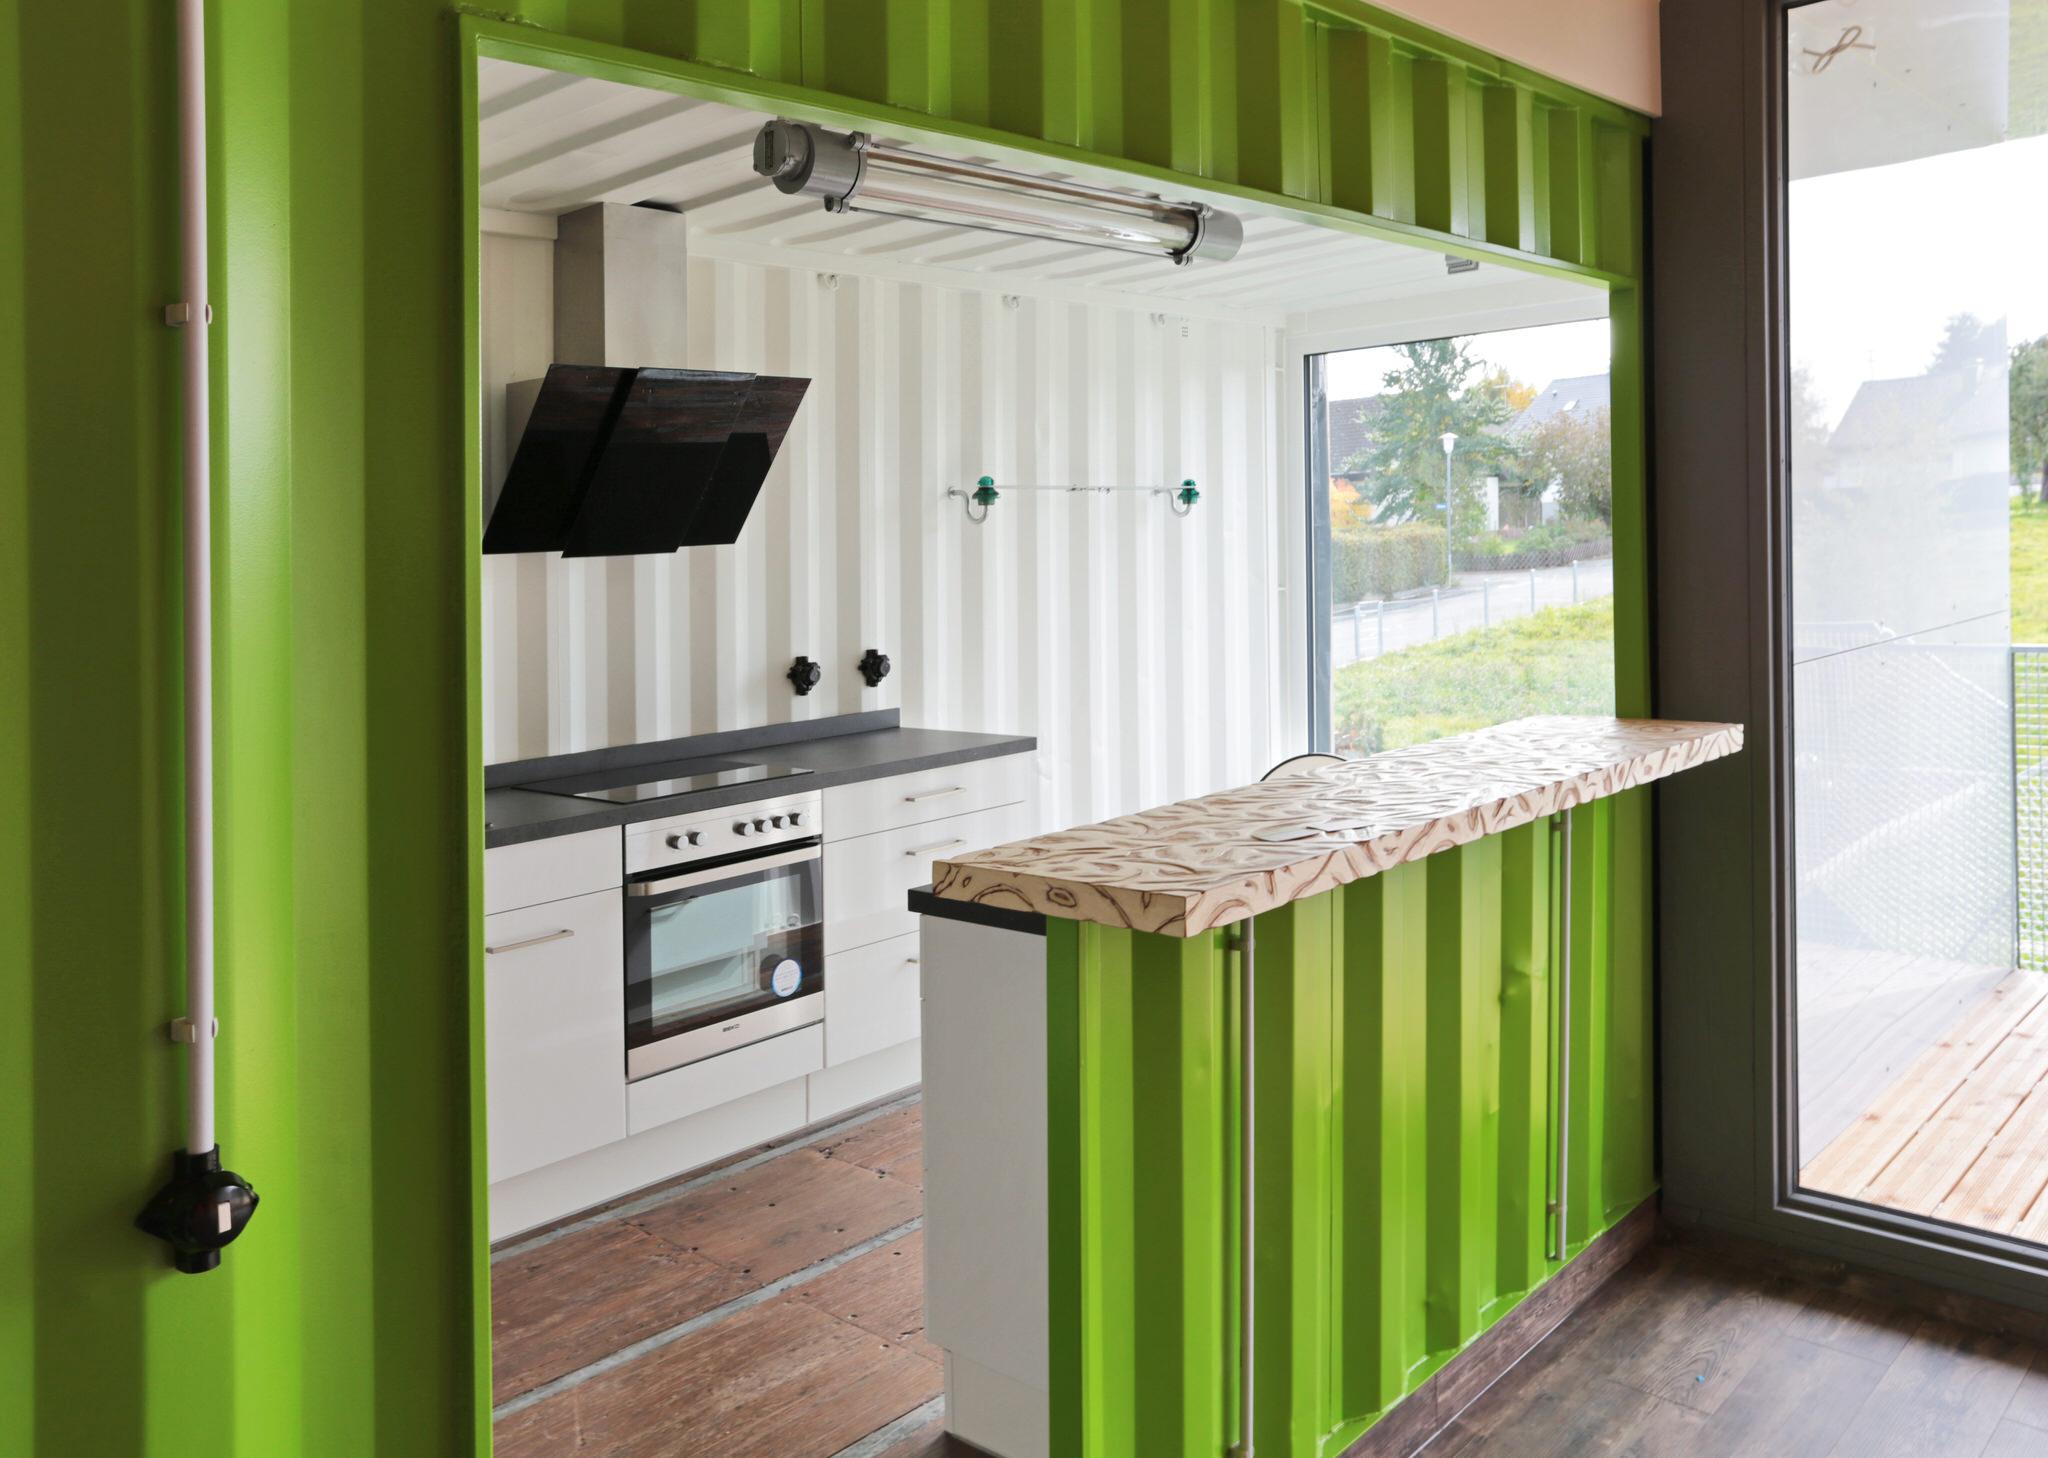 container haus ideen welt ug haftungsbeschraenkt. Black Bedroom Furniture Sets. Home Design Ideas